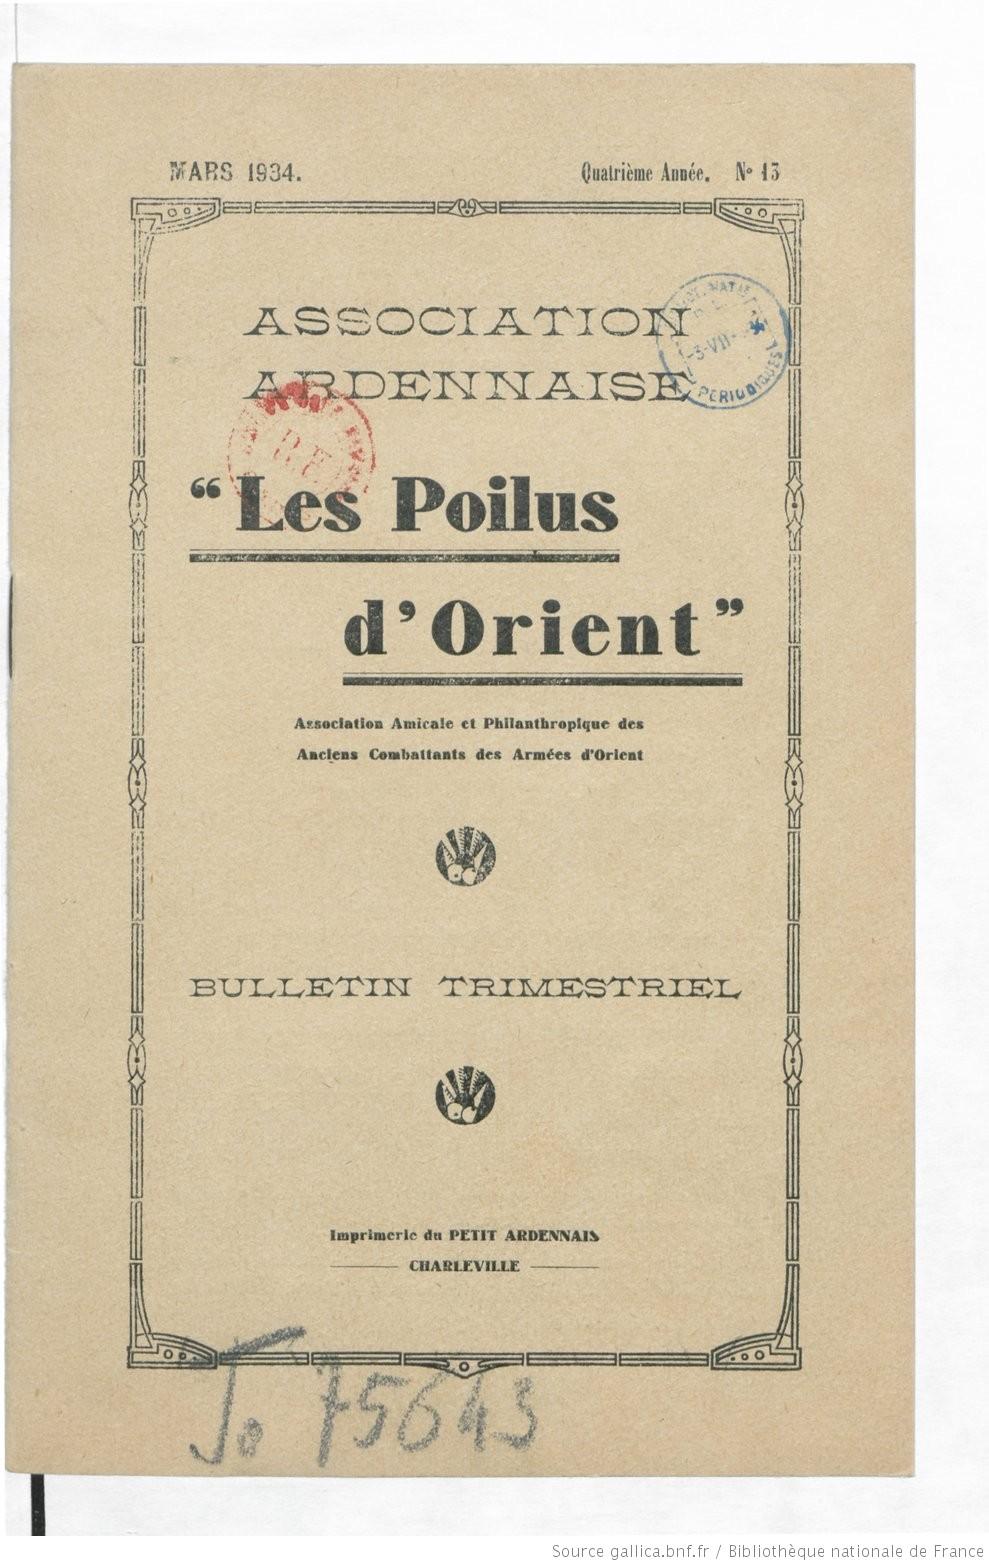 http://gallica.bnf.fr/ark:/12148/bpt6k974524c/f1.highres